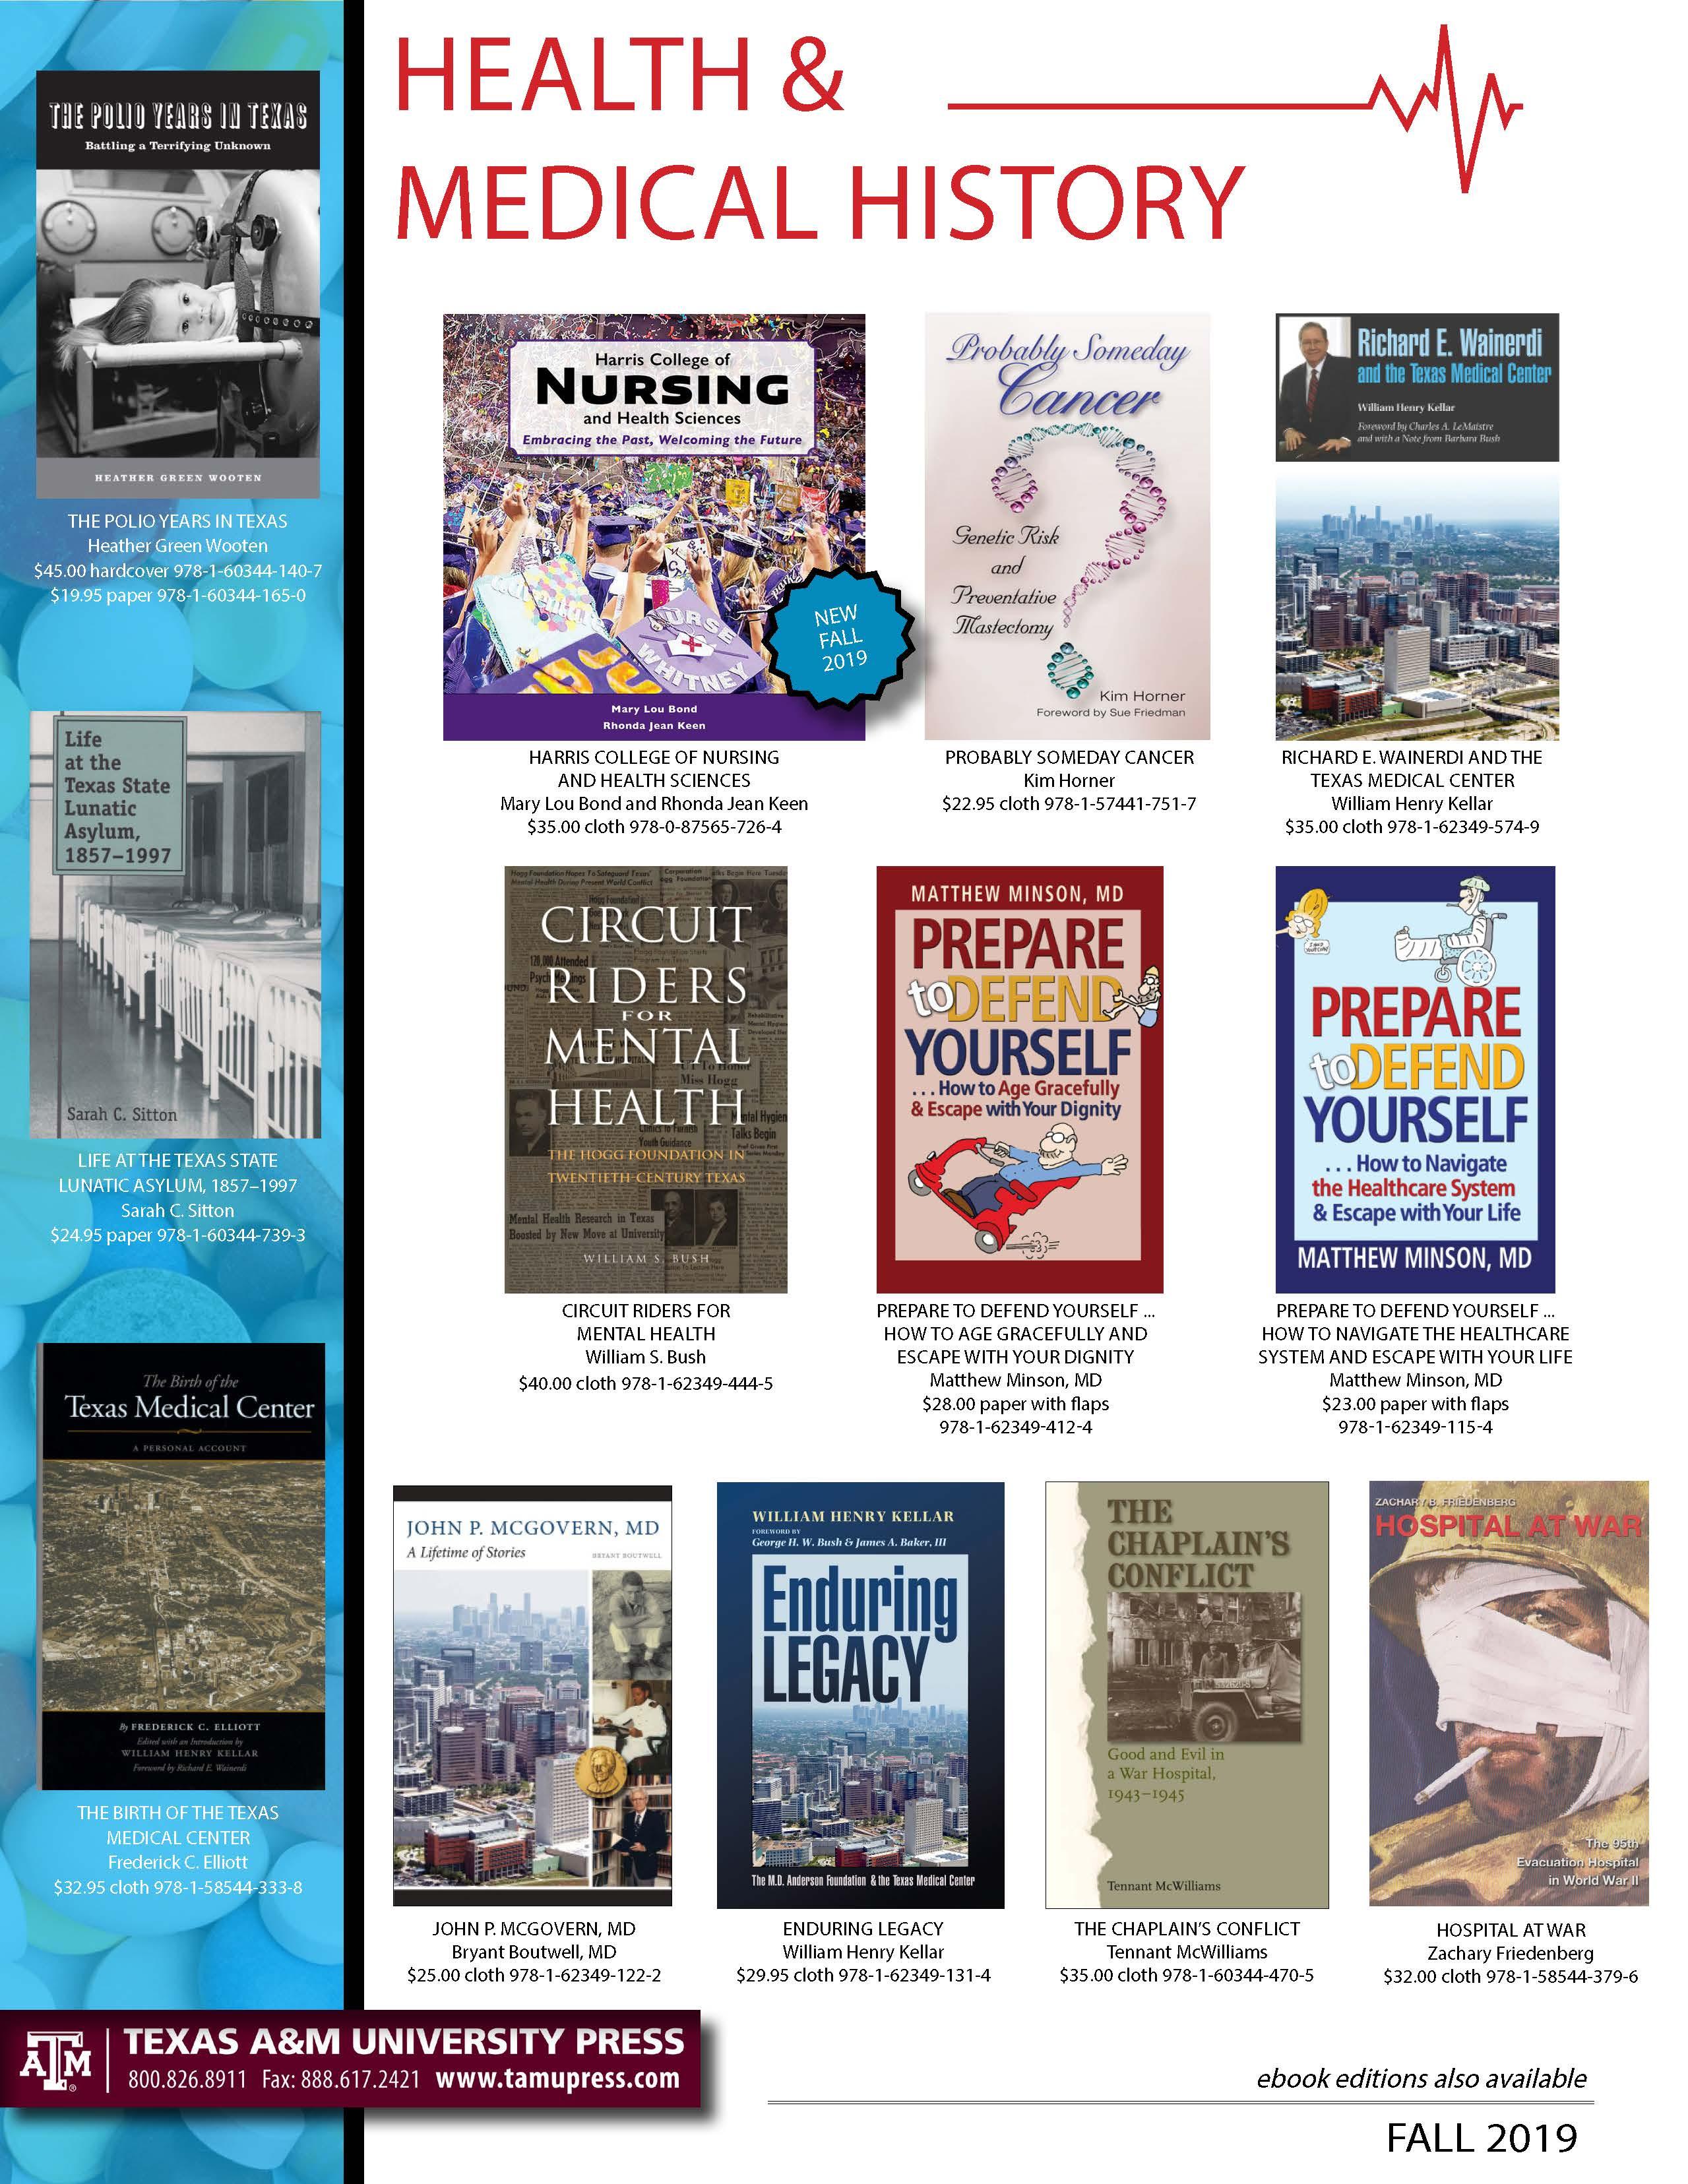 Health & Medical History